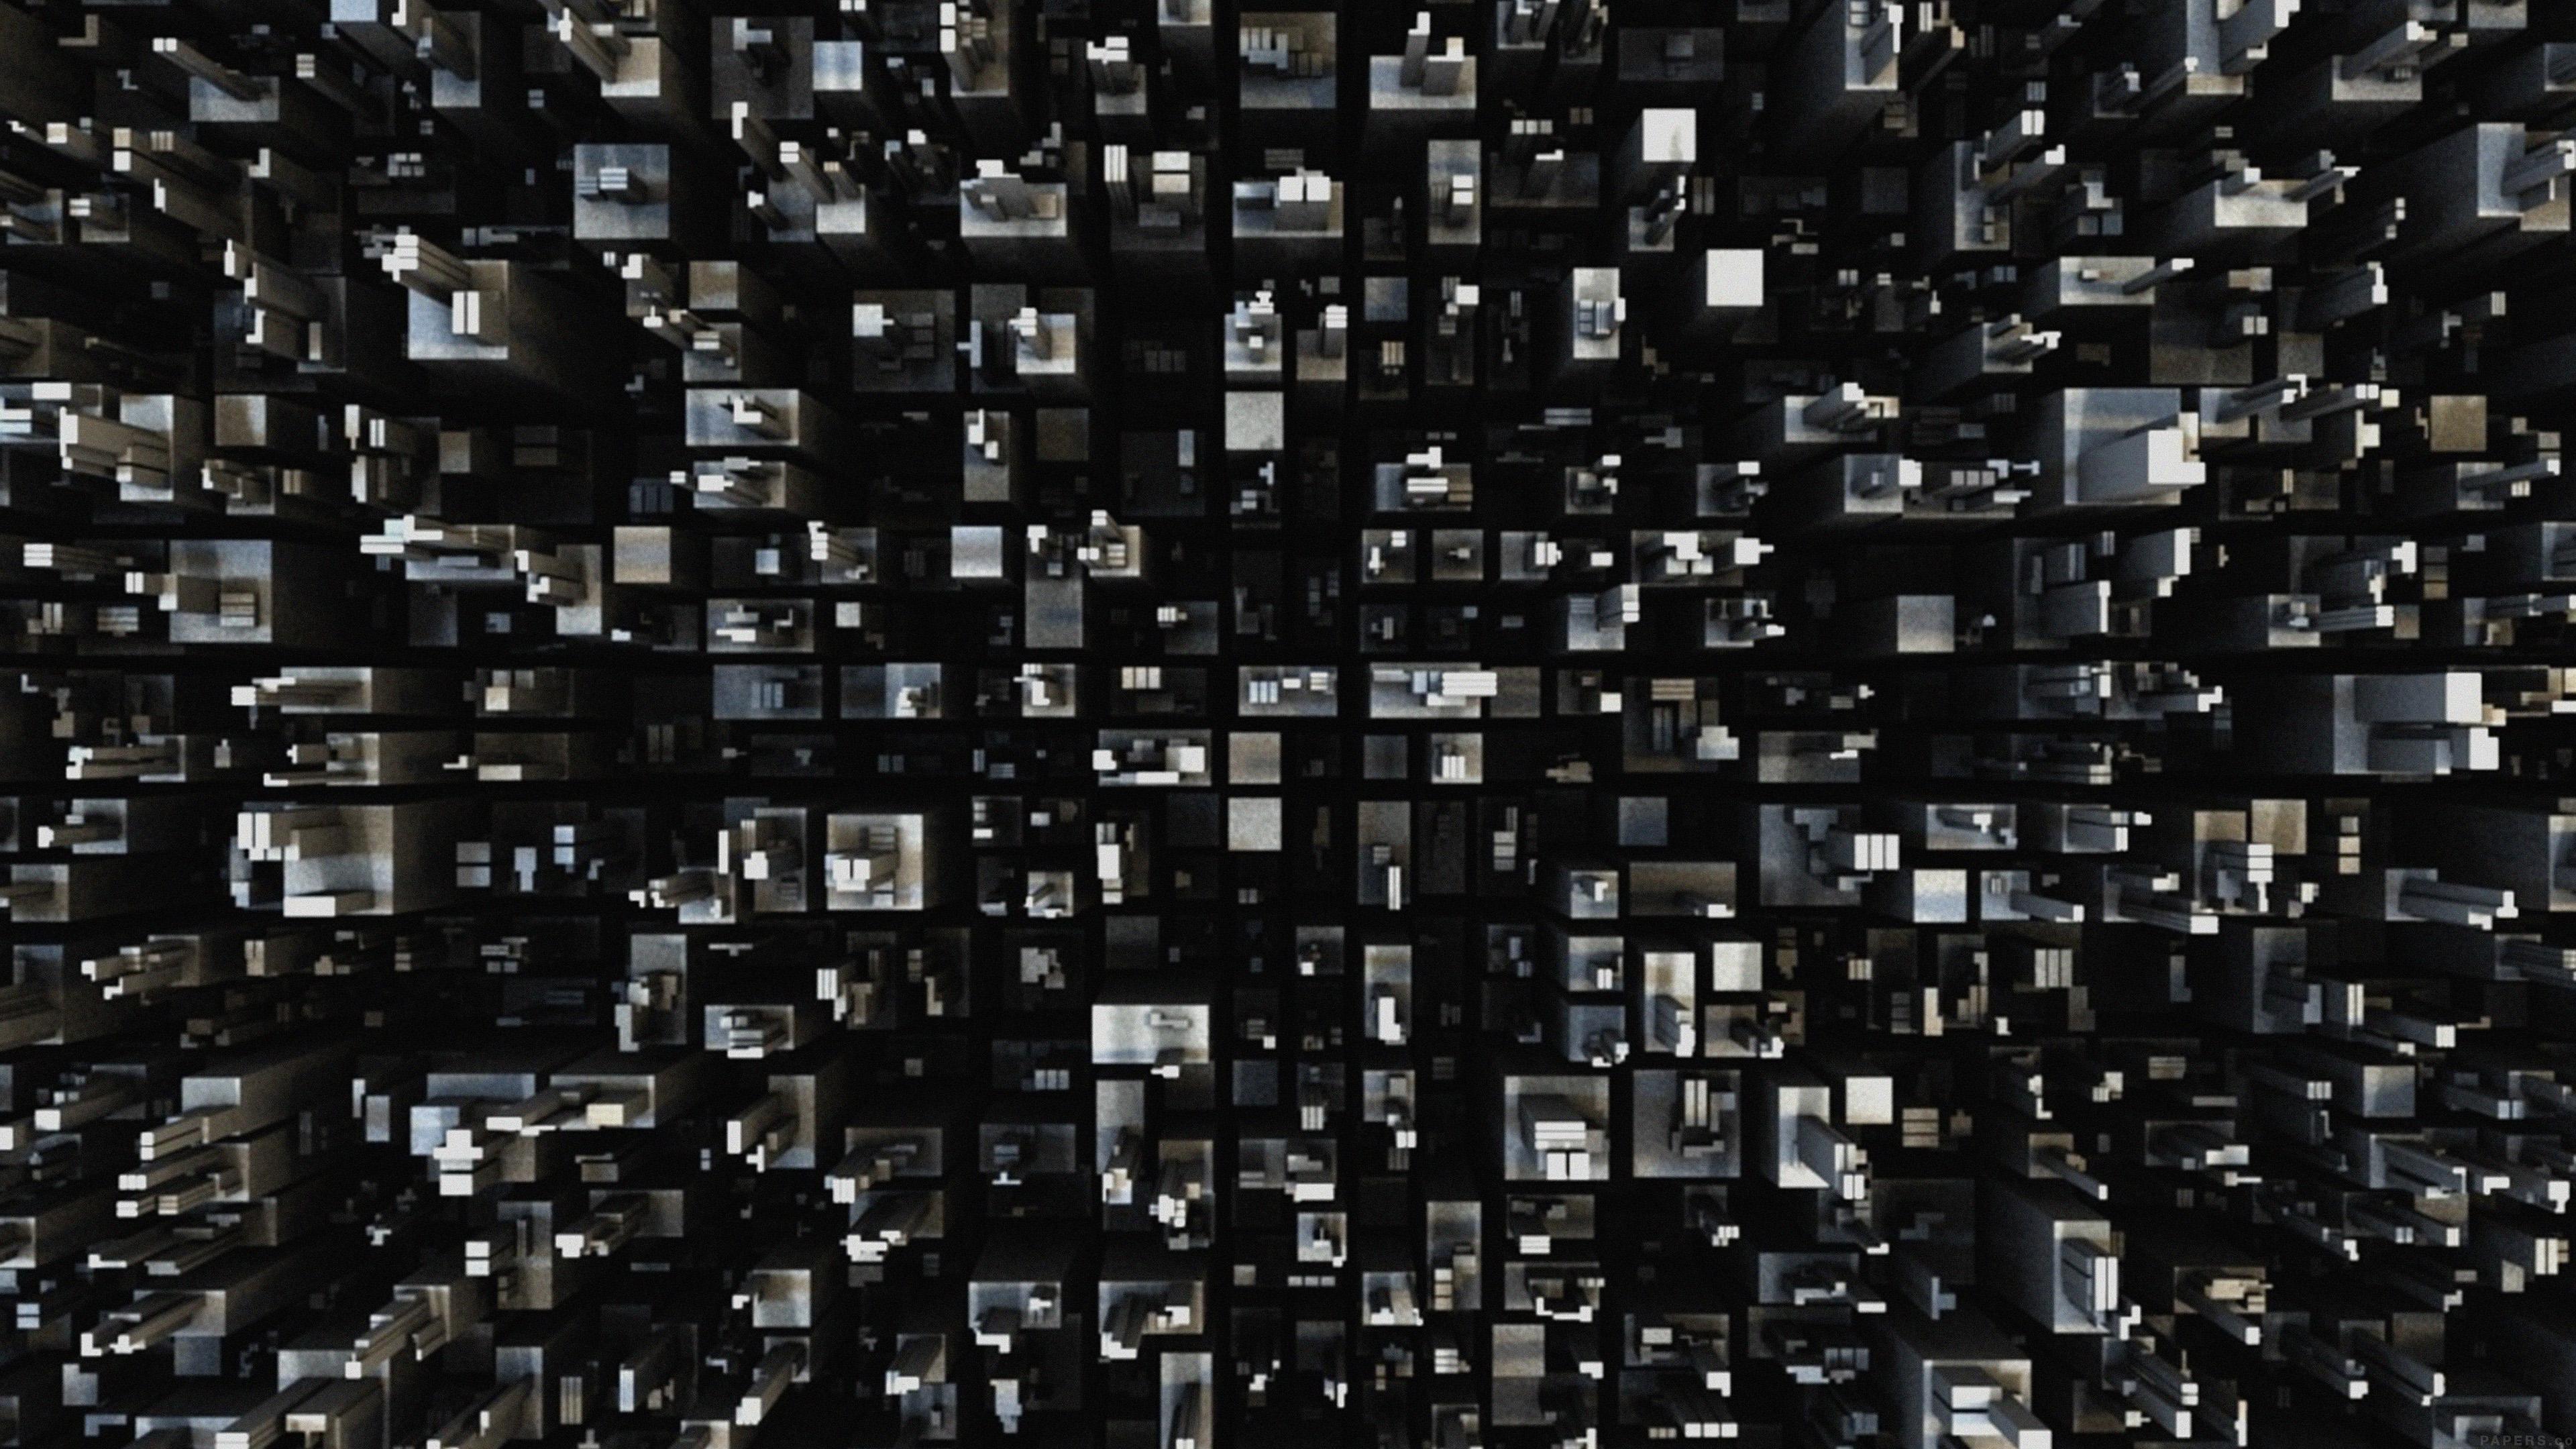 hd wallpapers for macbook air 13.3